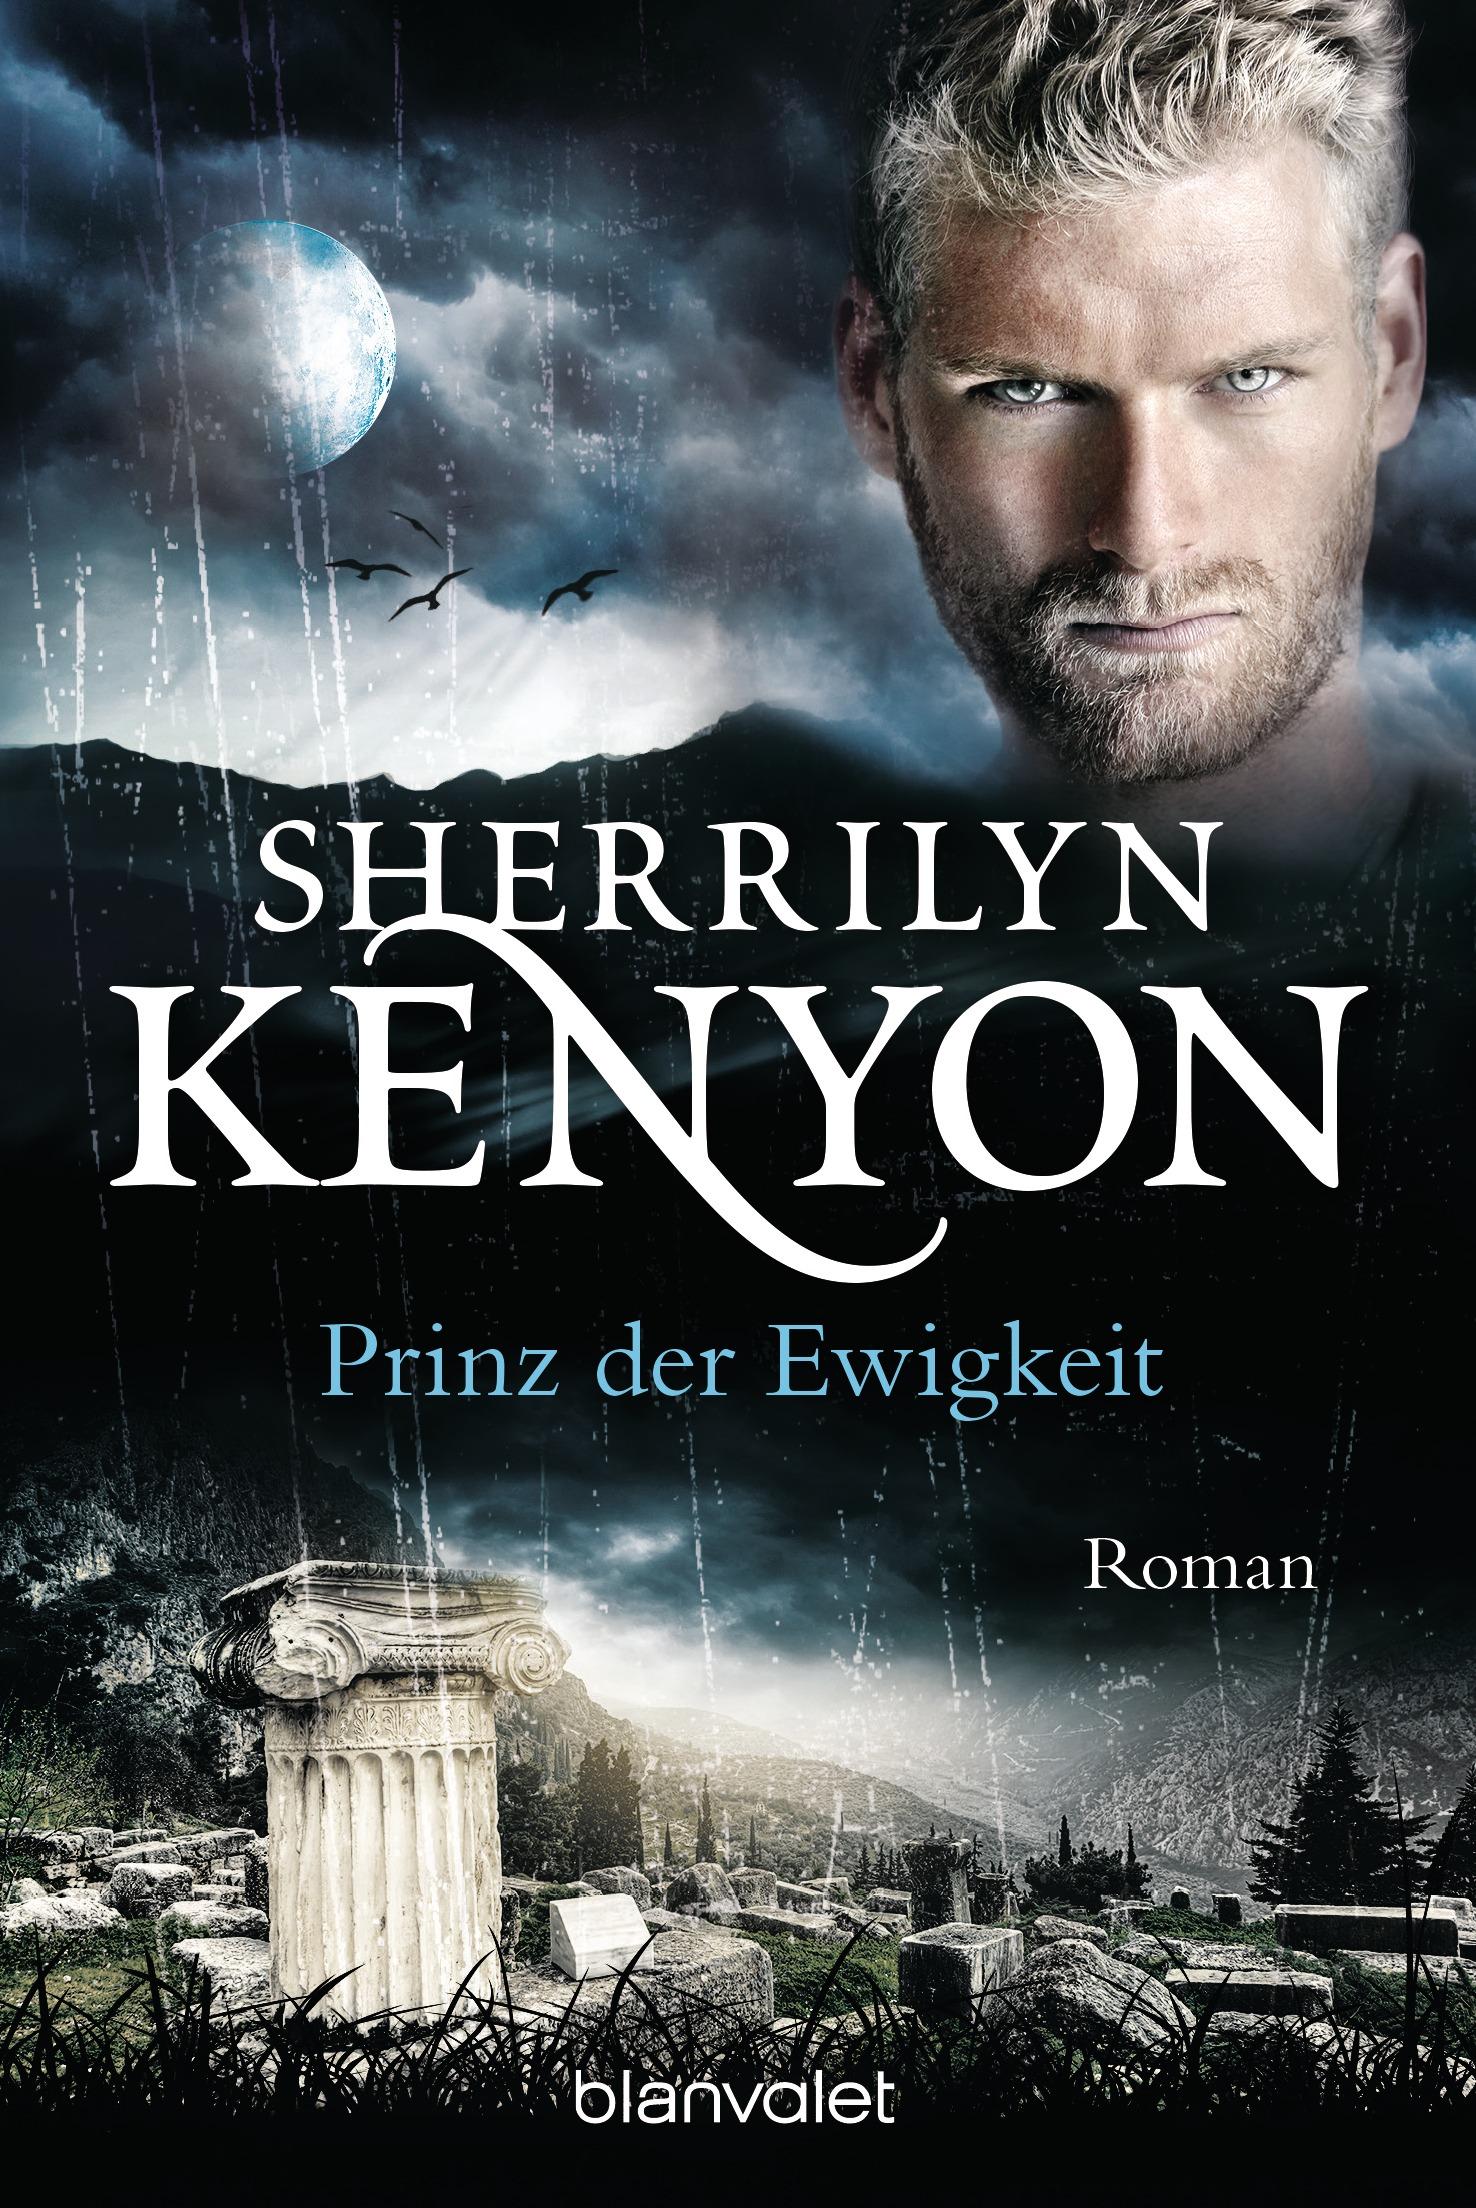 Prinz der Ewigkeit - Sherrilyn Kenyon